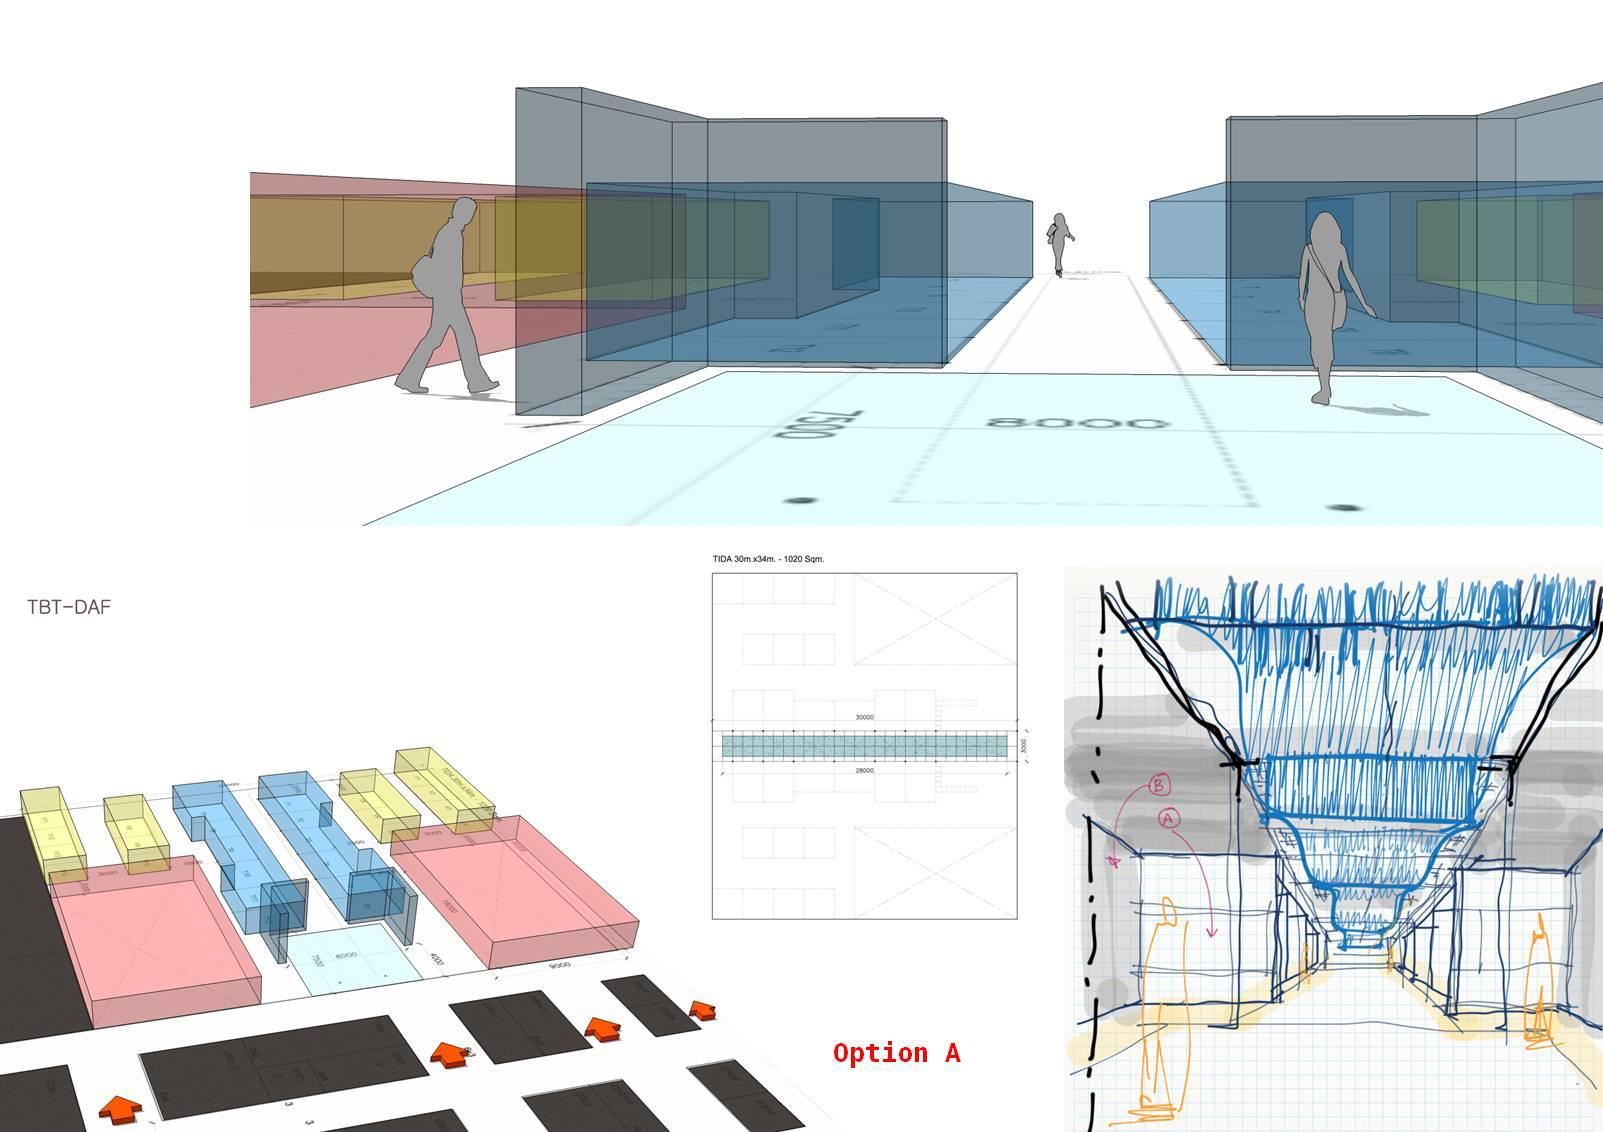 TBT-DAF interior design TIDA SALONE THAILAND 2012 6